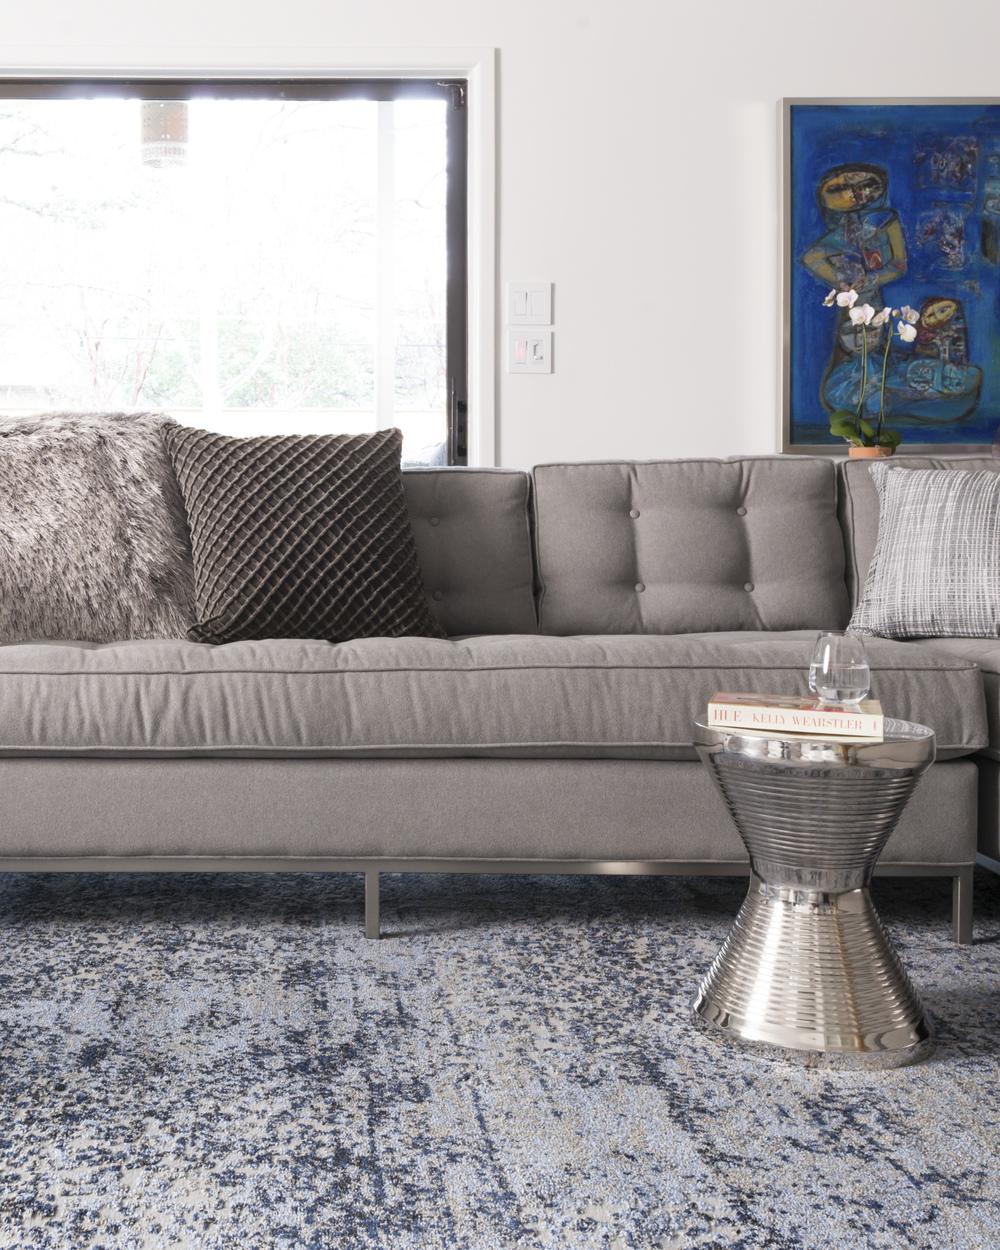 Loloi Rugs - Viera Rug (Light Blue/Grey)